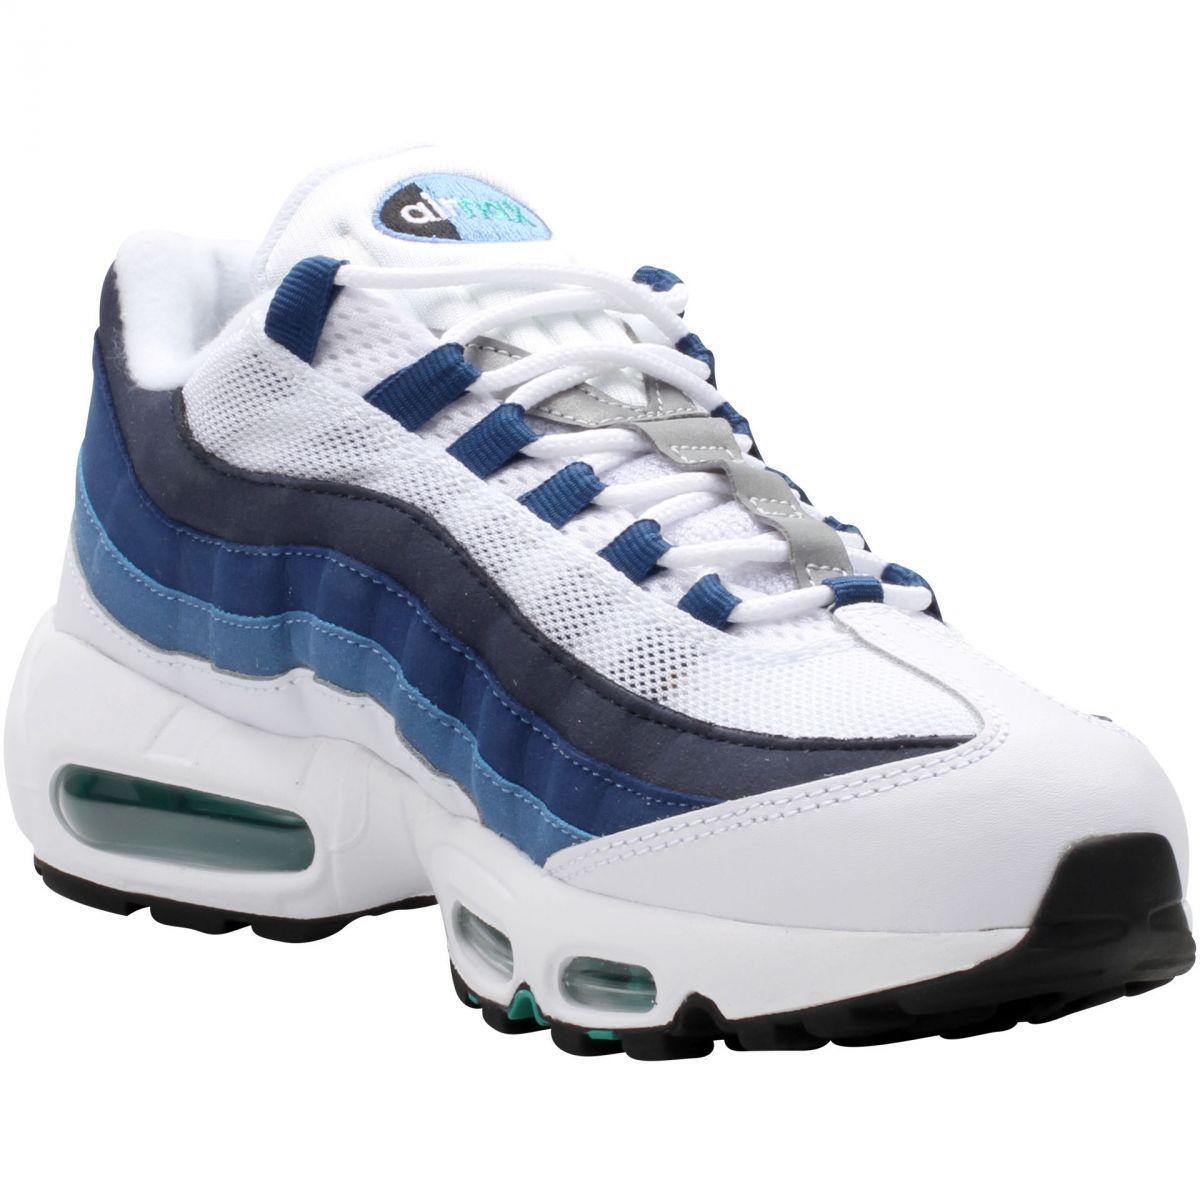 Кроссовки Nike Air Max 95 женские бело-синие